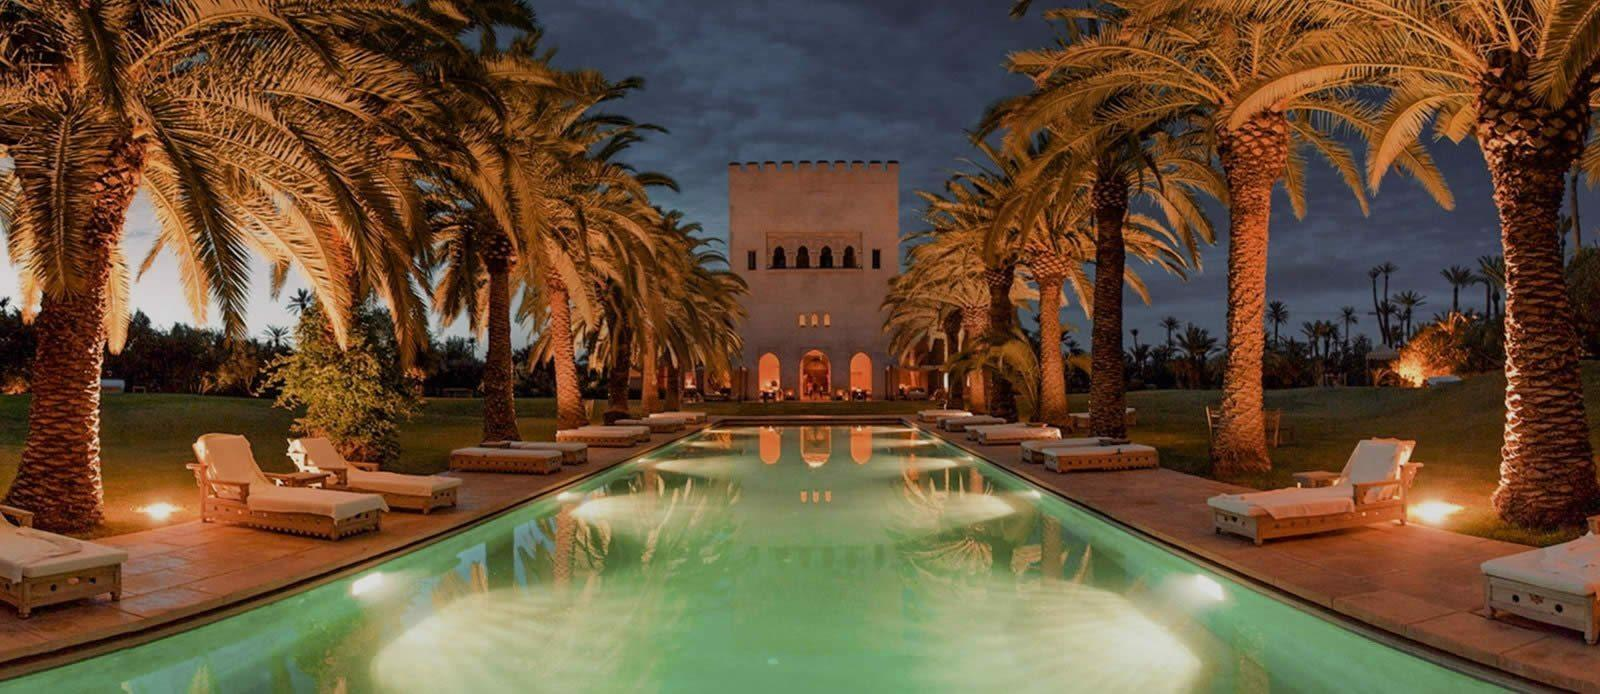 palais-ksar-char-bargh-hotel-intimiste-cache-milieu-palmeraie